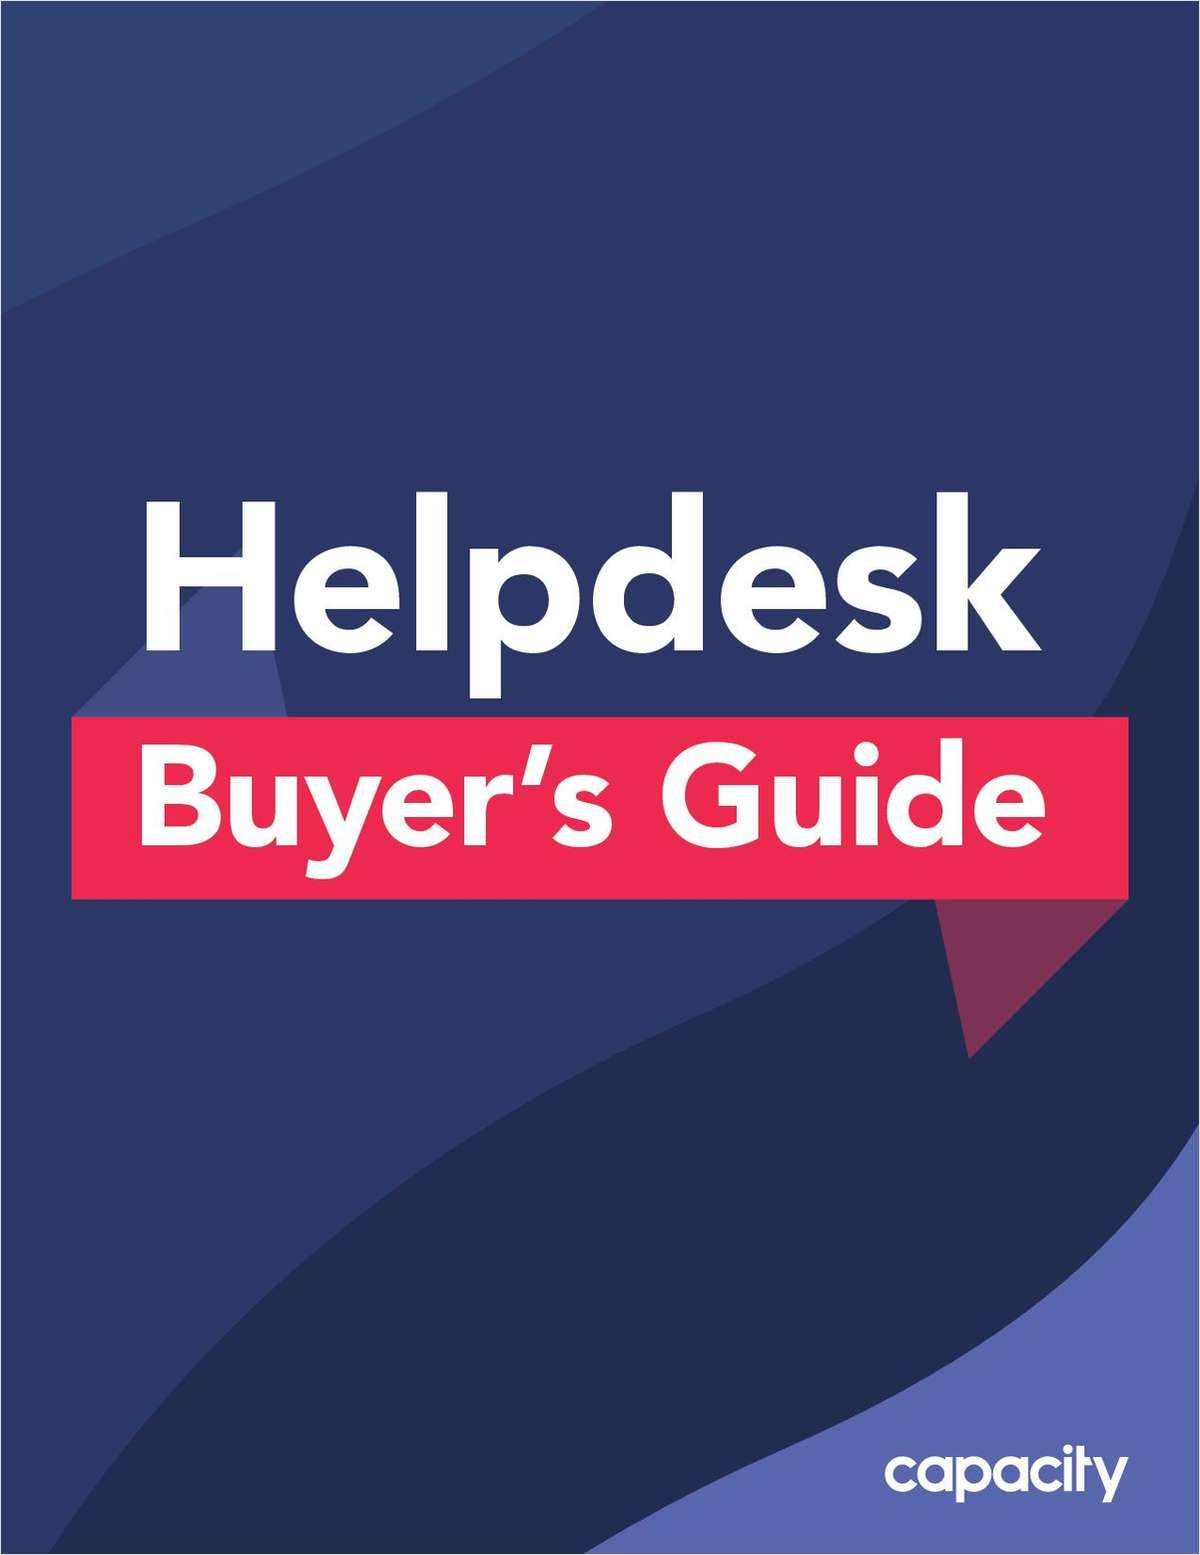 Helpdesk Buyer's Guide